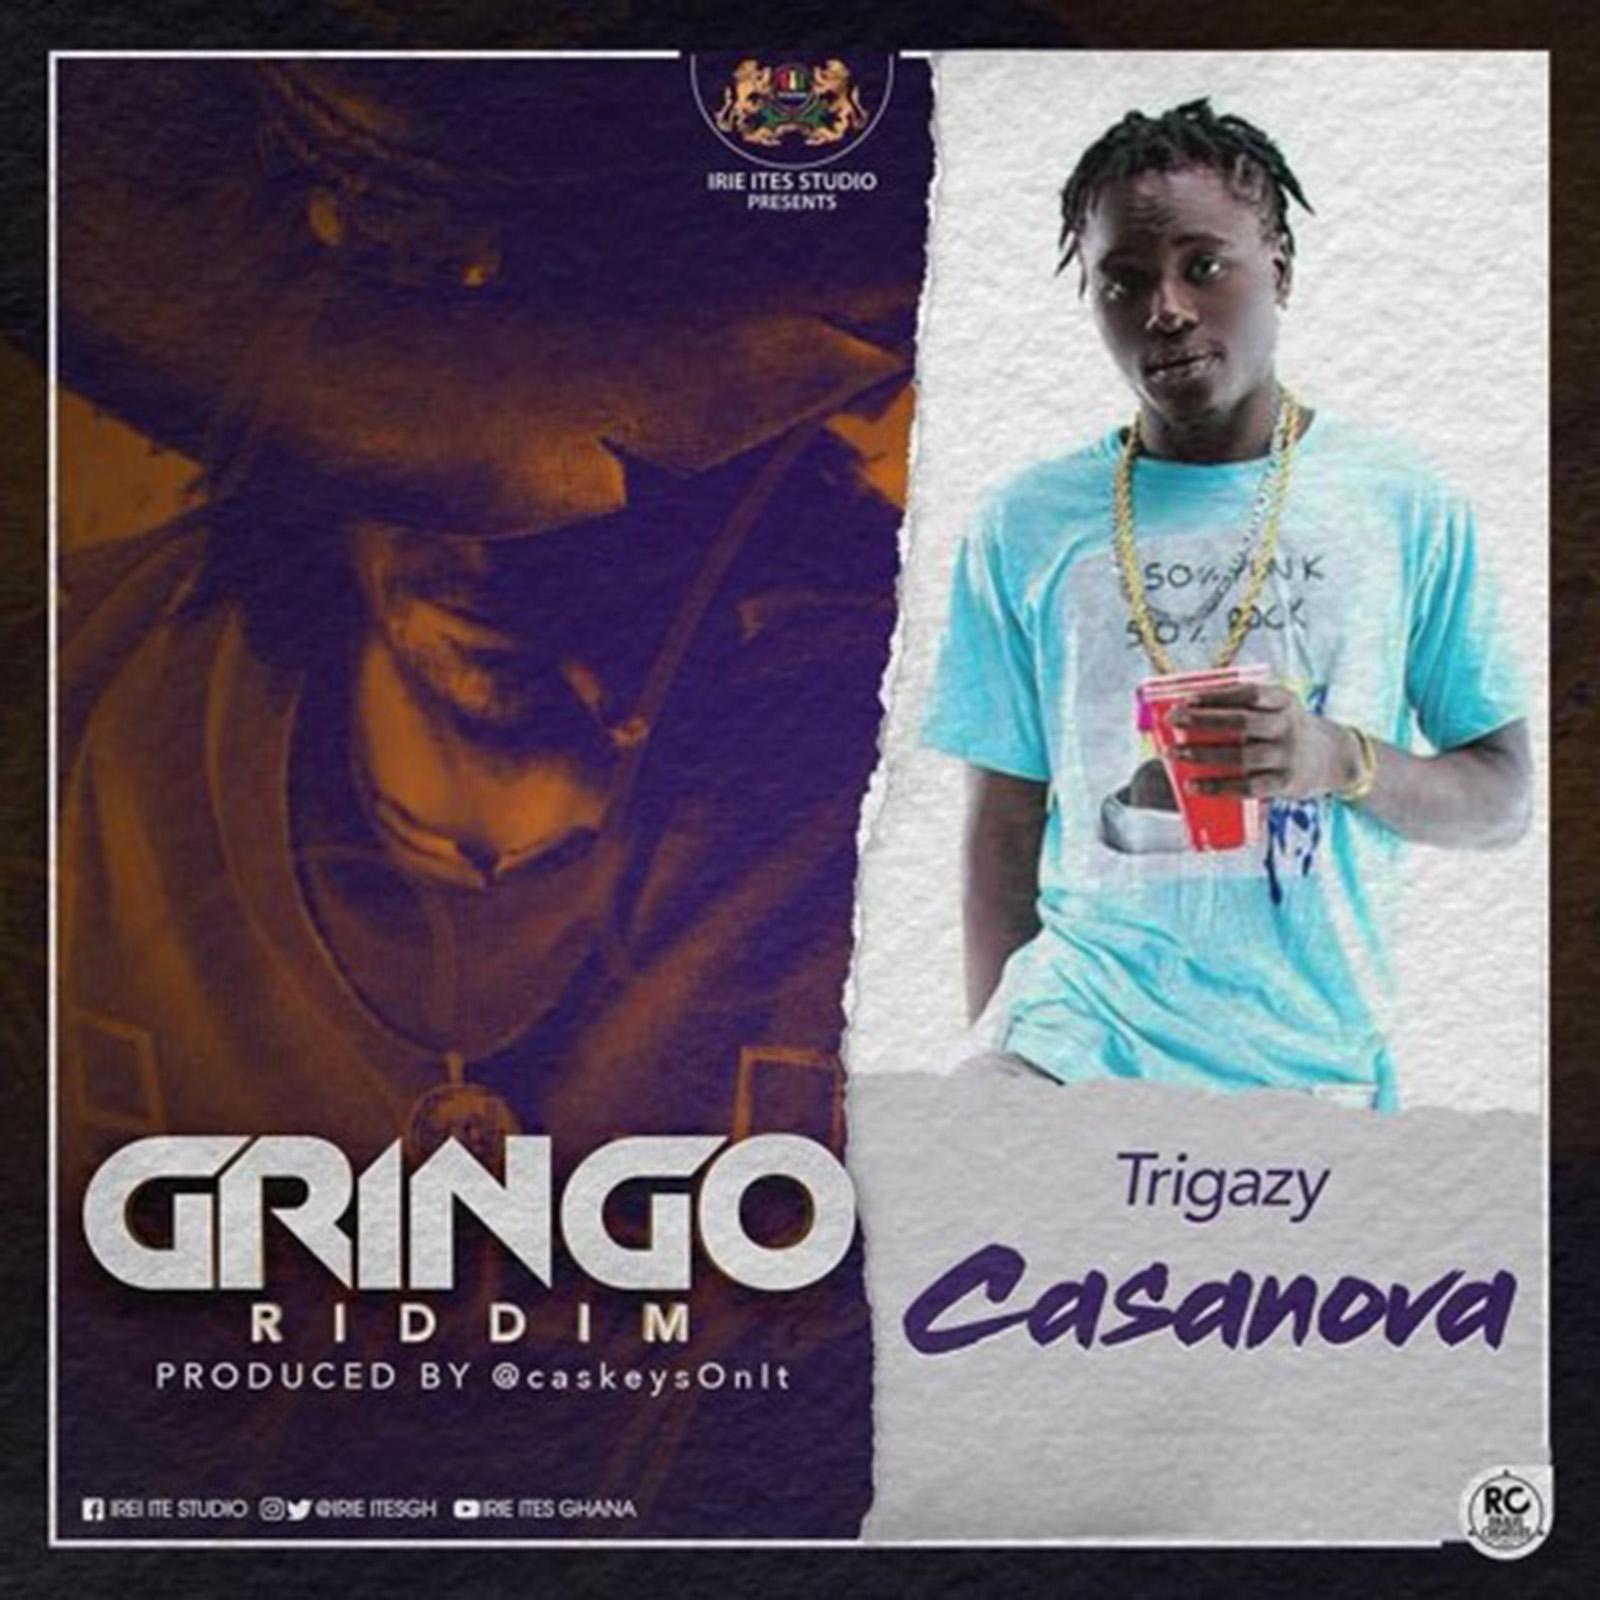 Casanova (Gringo Riddim) by Trigazy